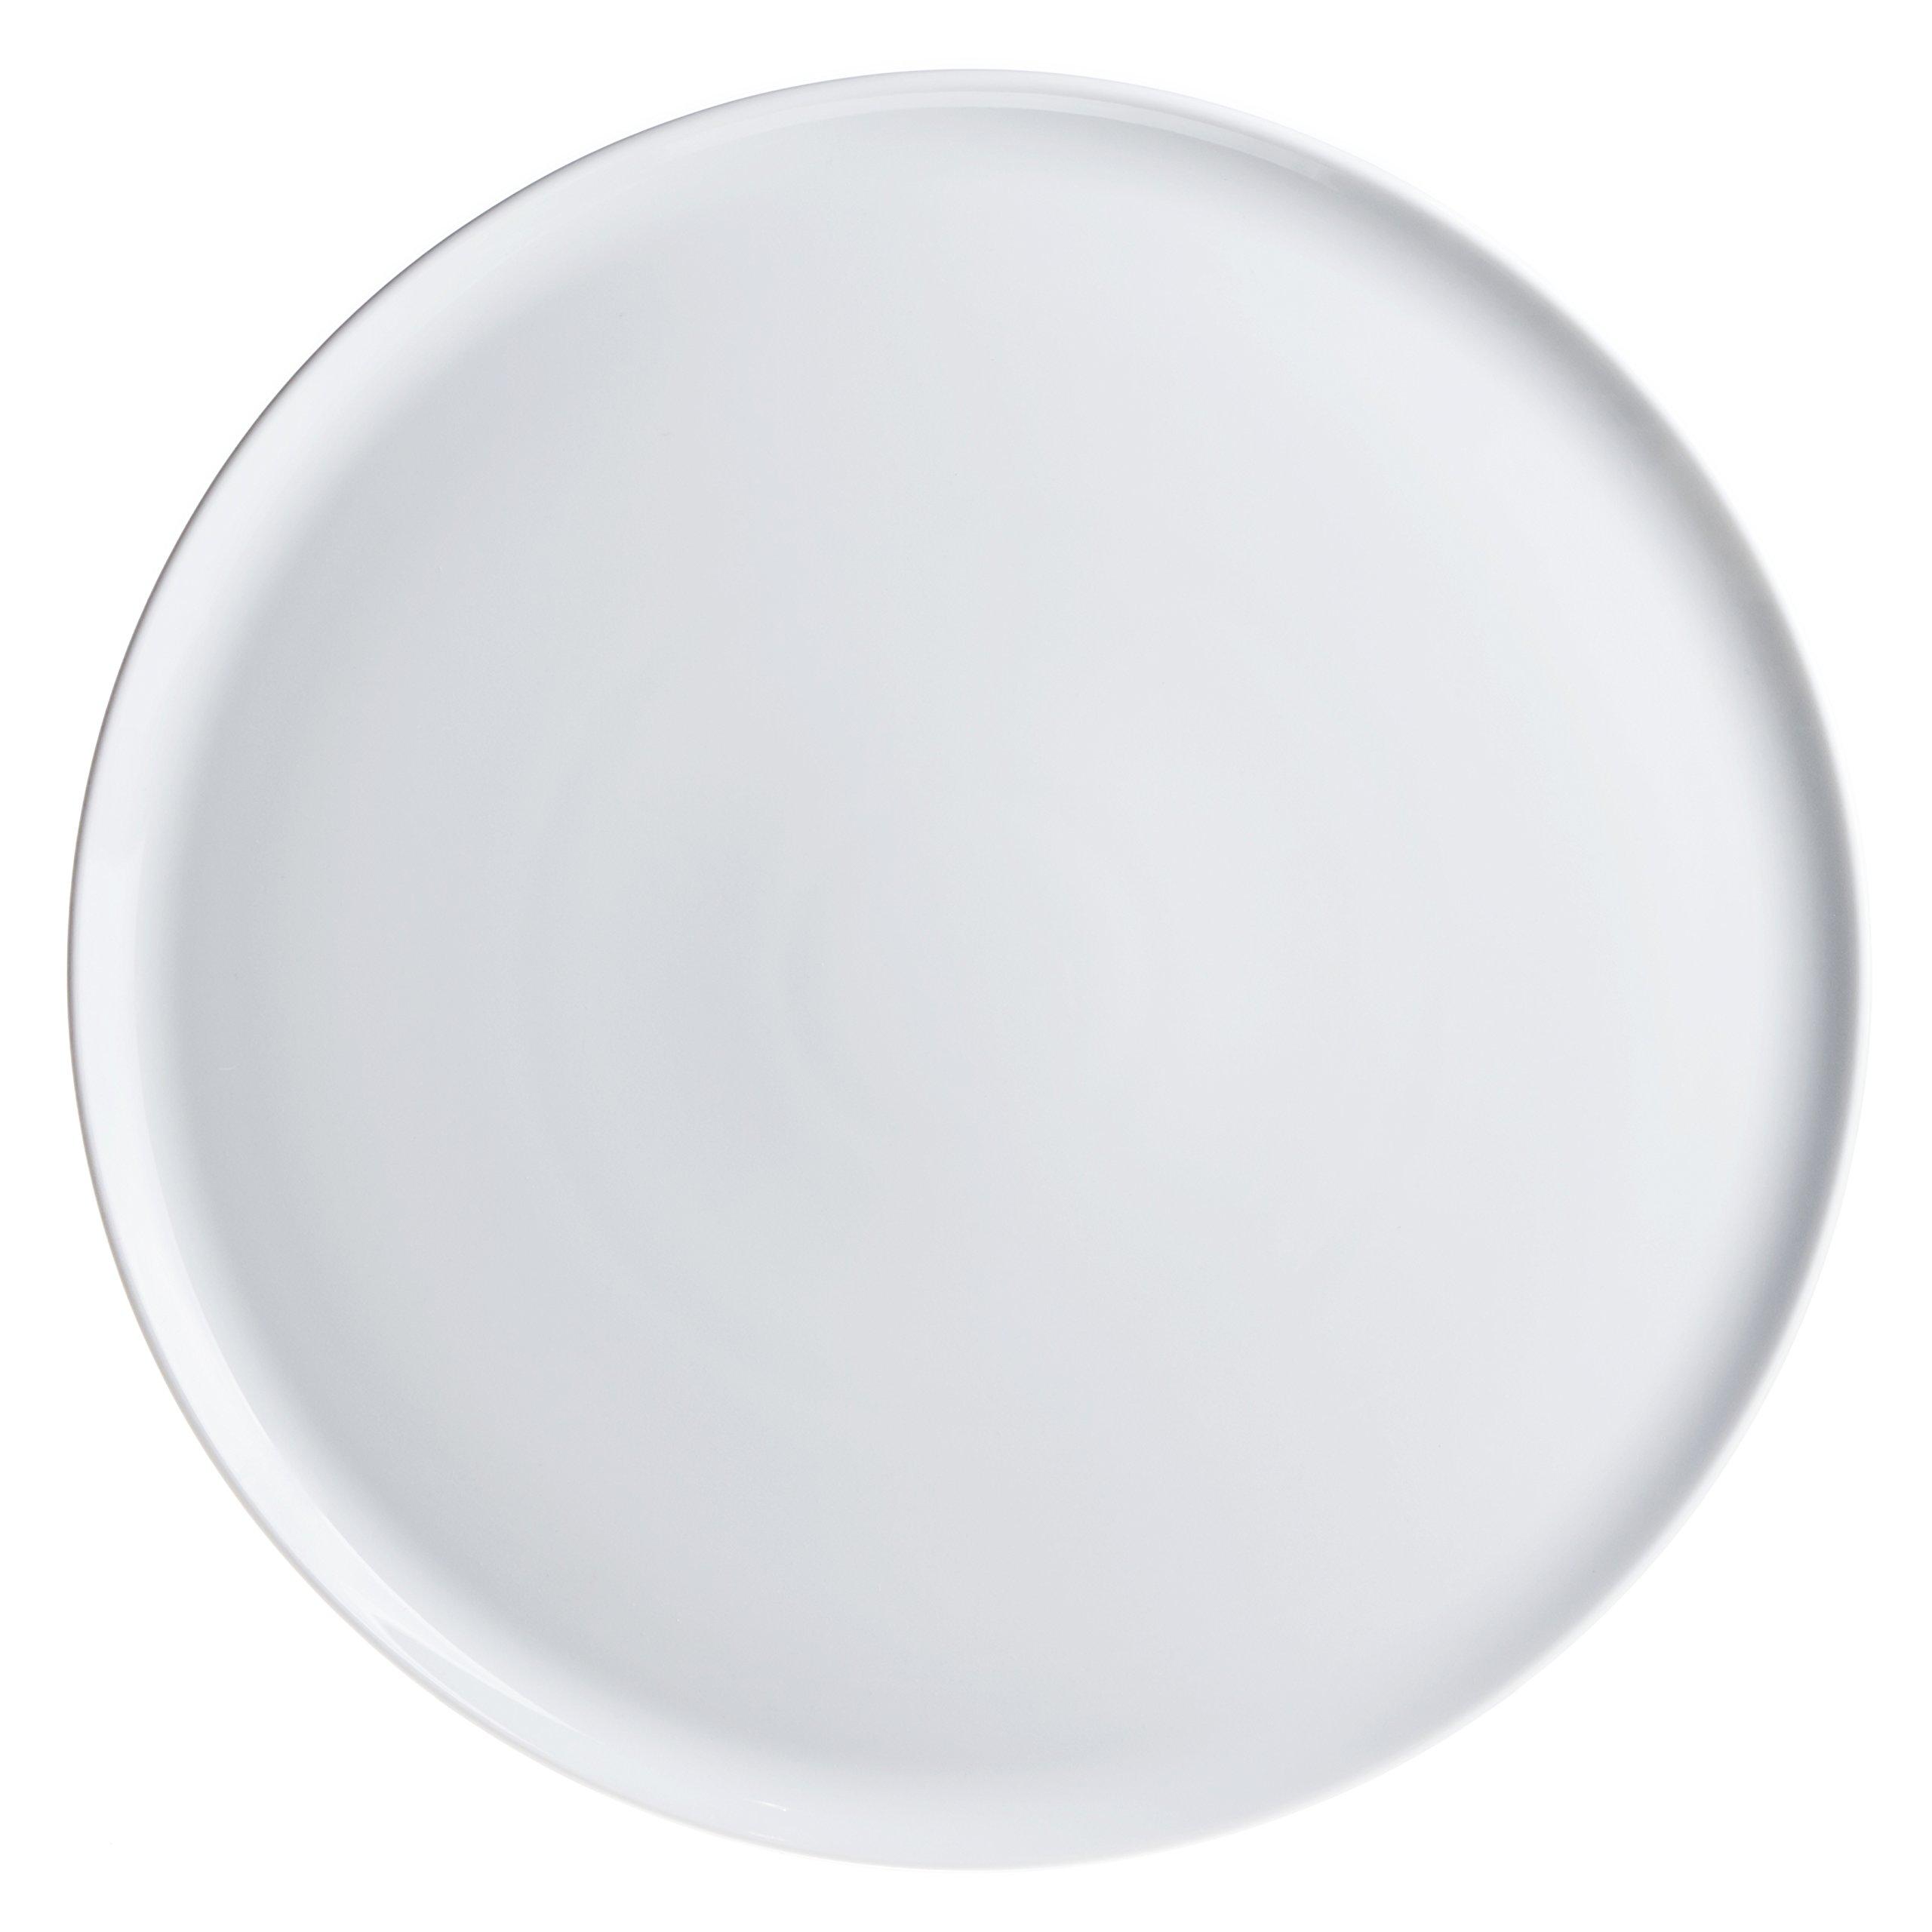 3-Piece Pizza/Pie/Serving Platters (Dishes) Set, White Porcelain, Restaurant&Hotel Quality, size 12.6''